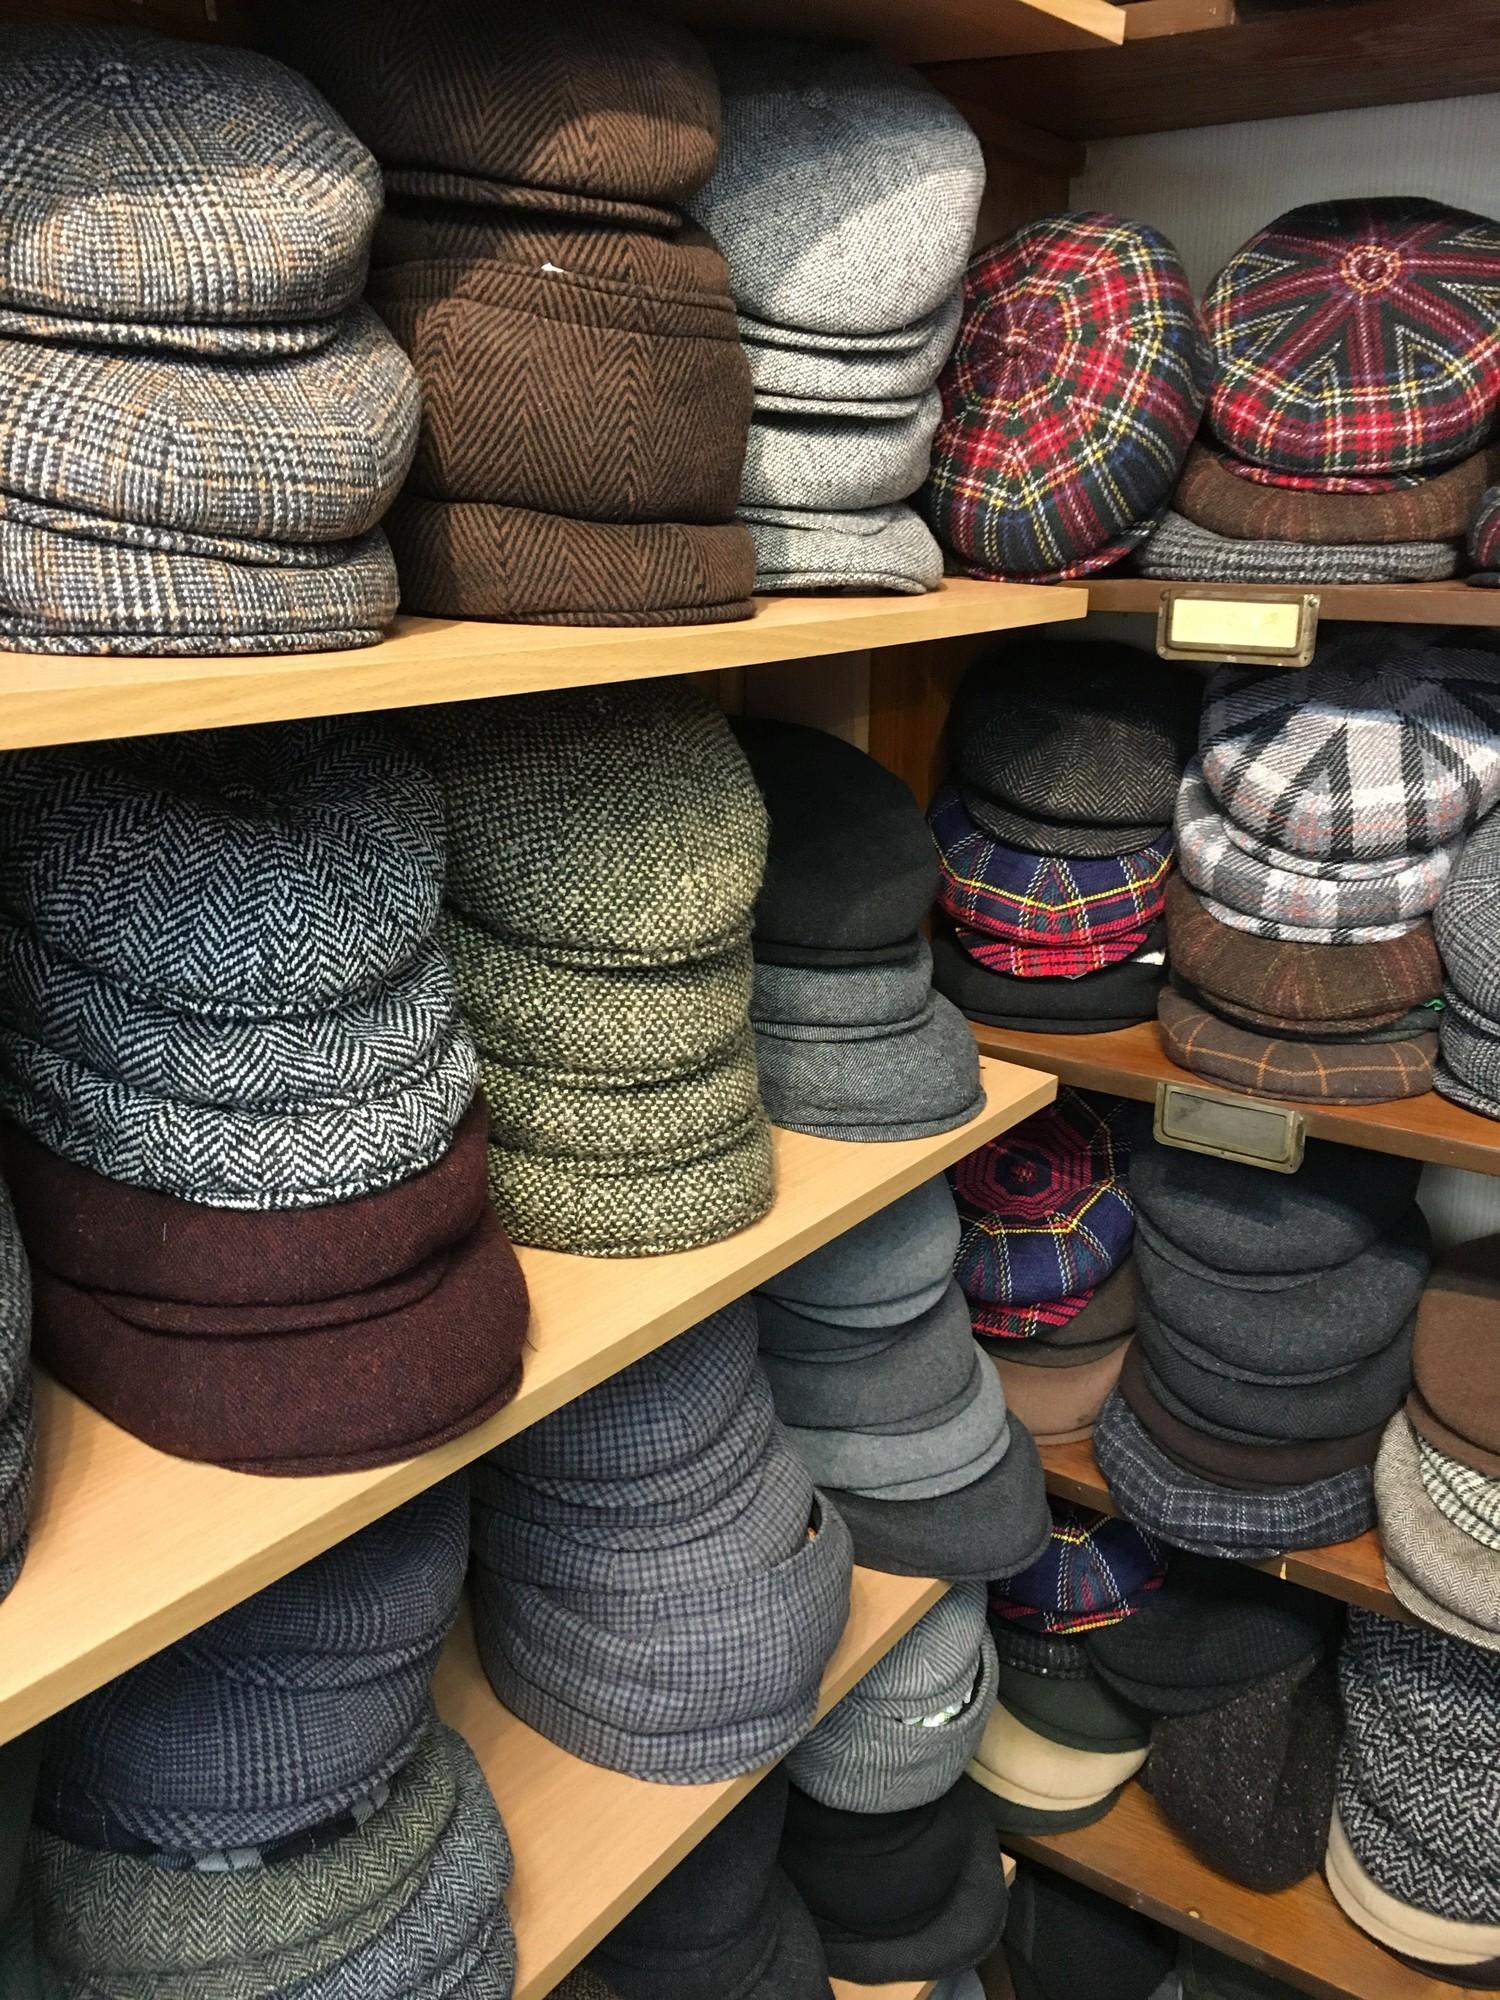 Chorąży Caps & Hats | Shopping in Kraków | Krakow